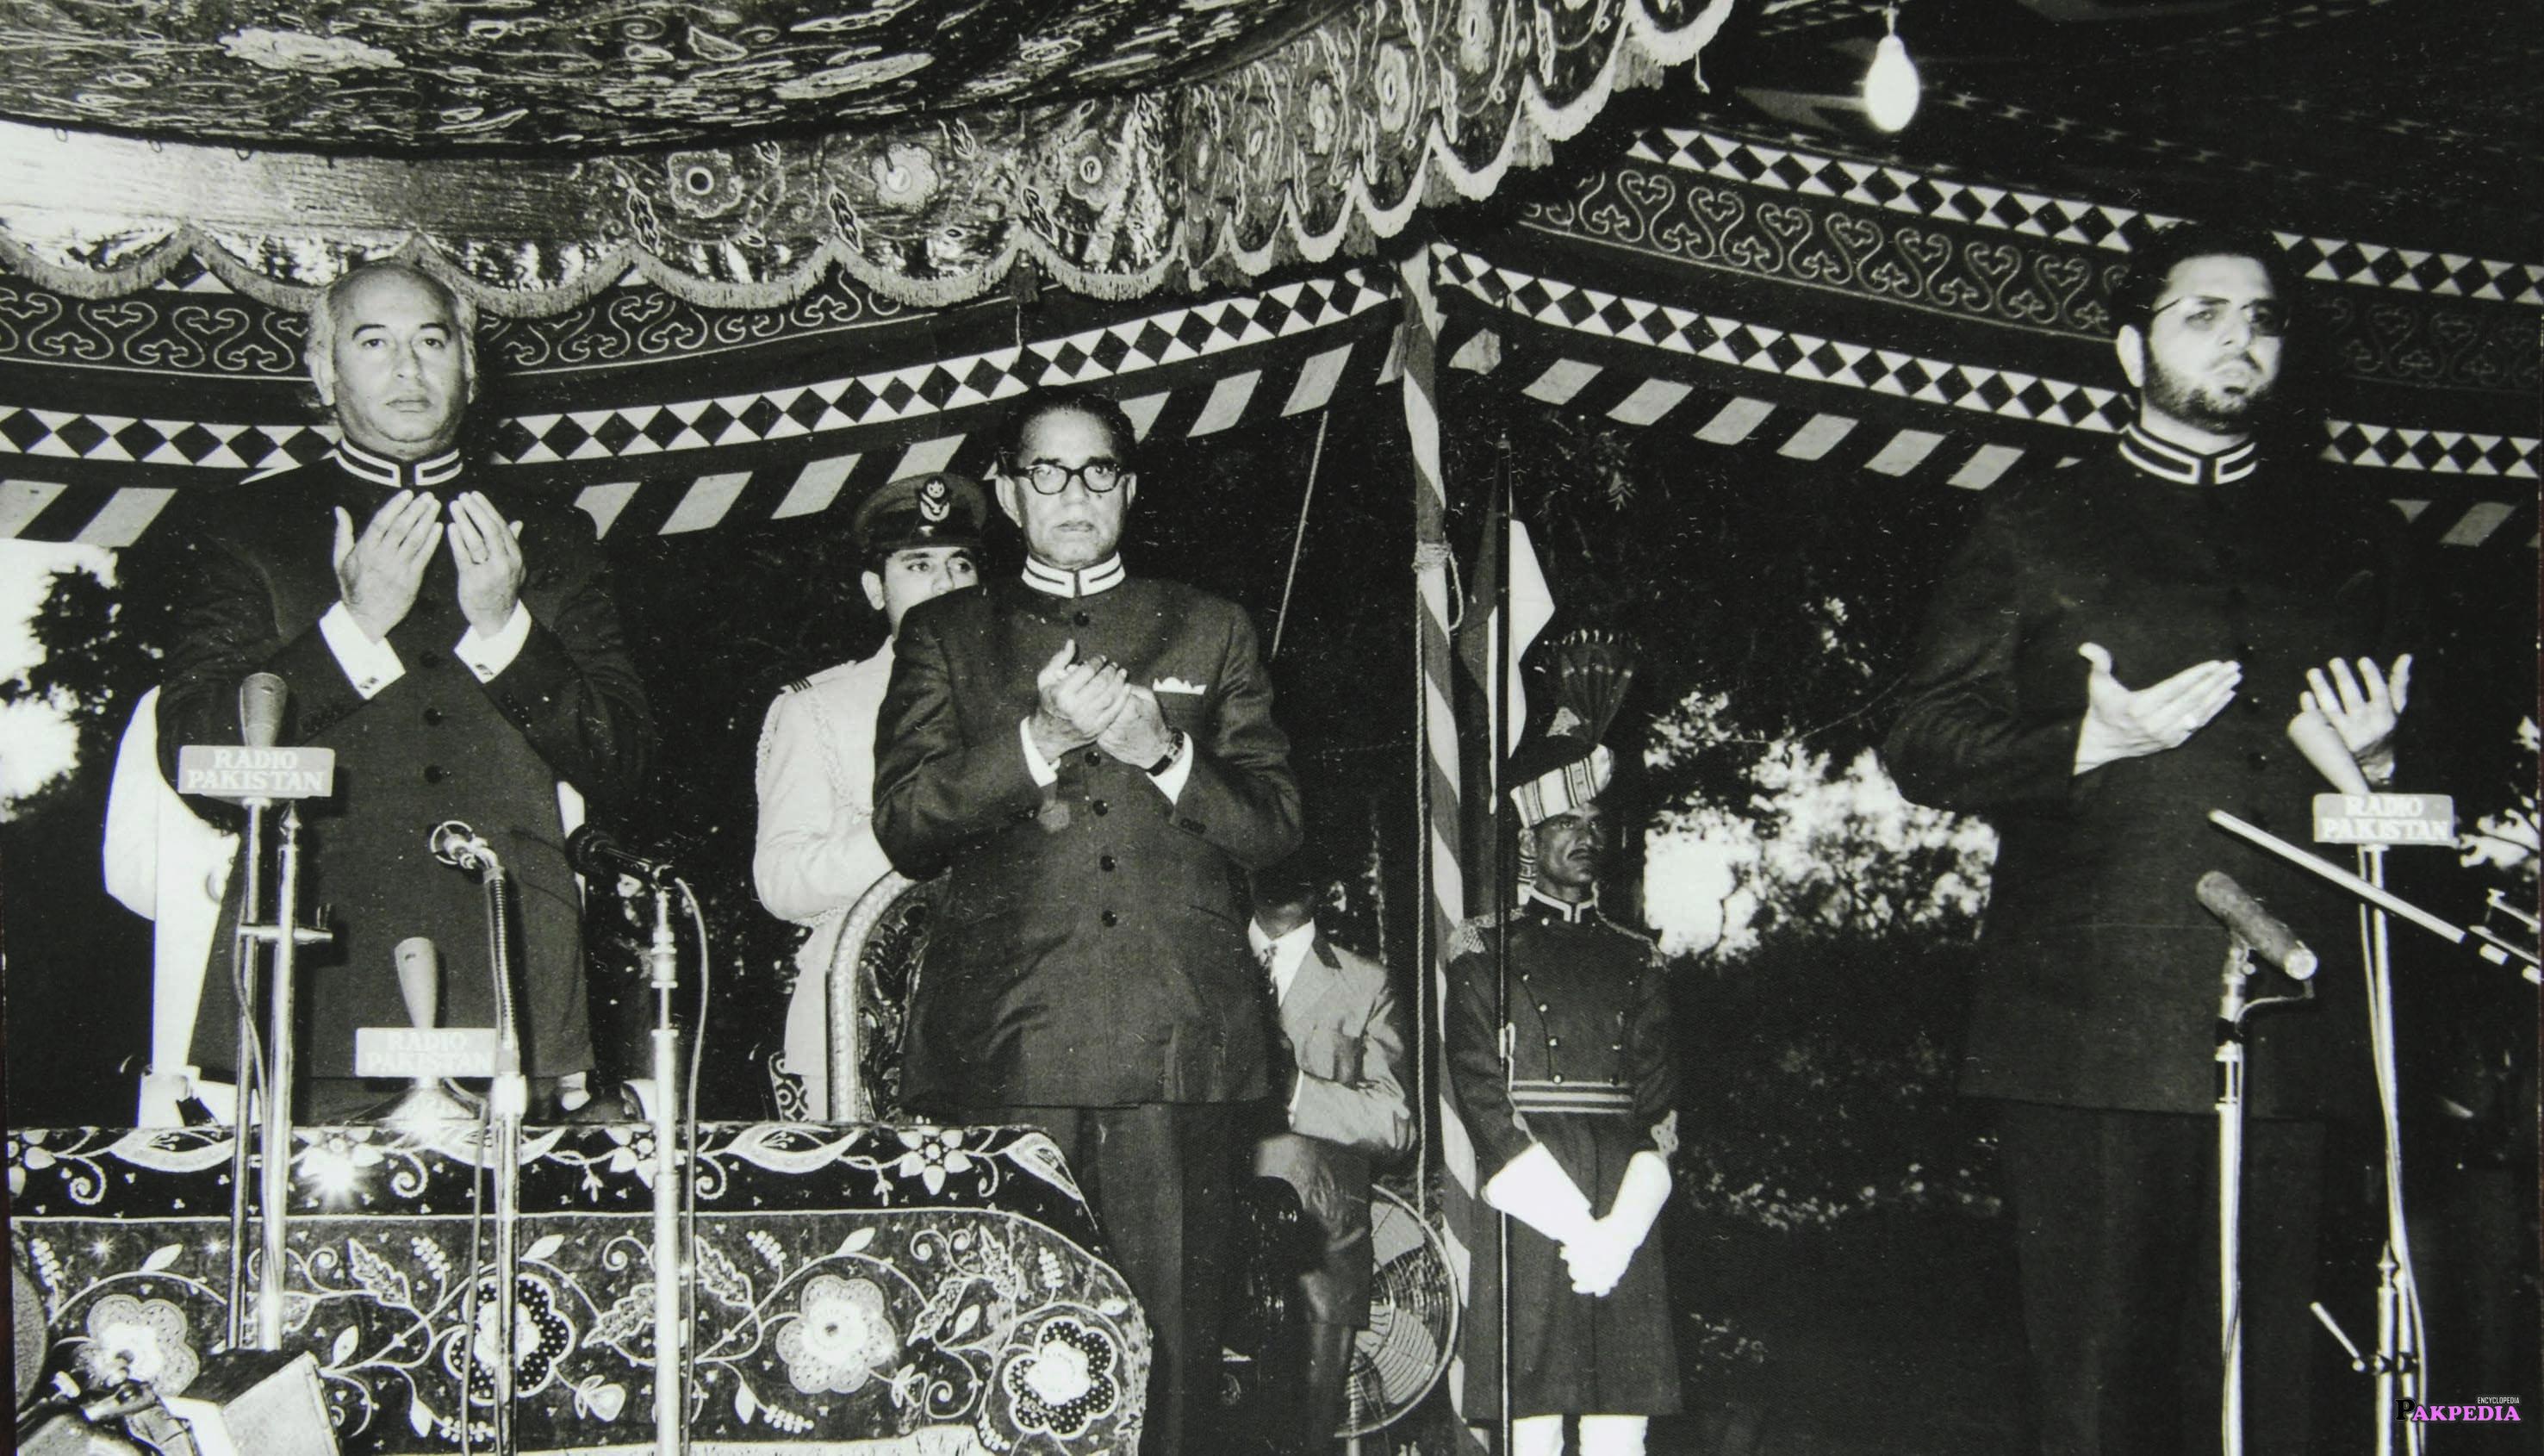 Fazal Elahi Chaudhry was praying